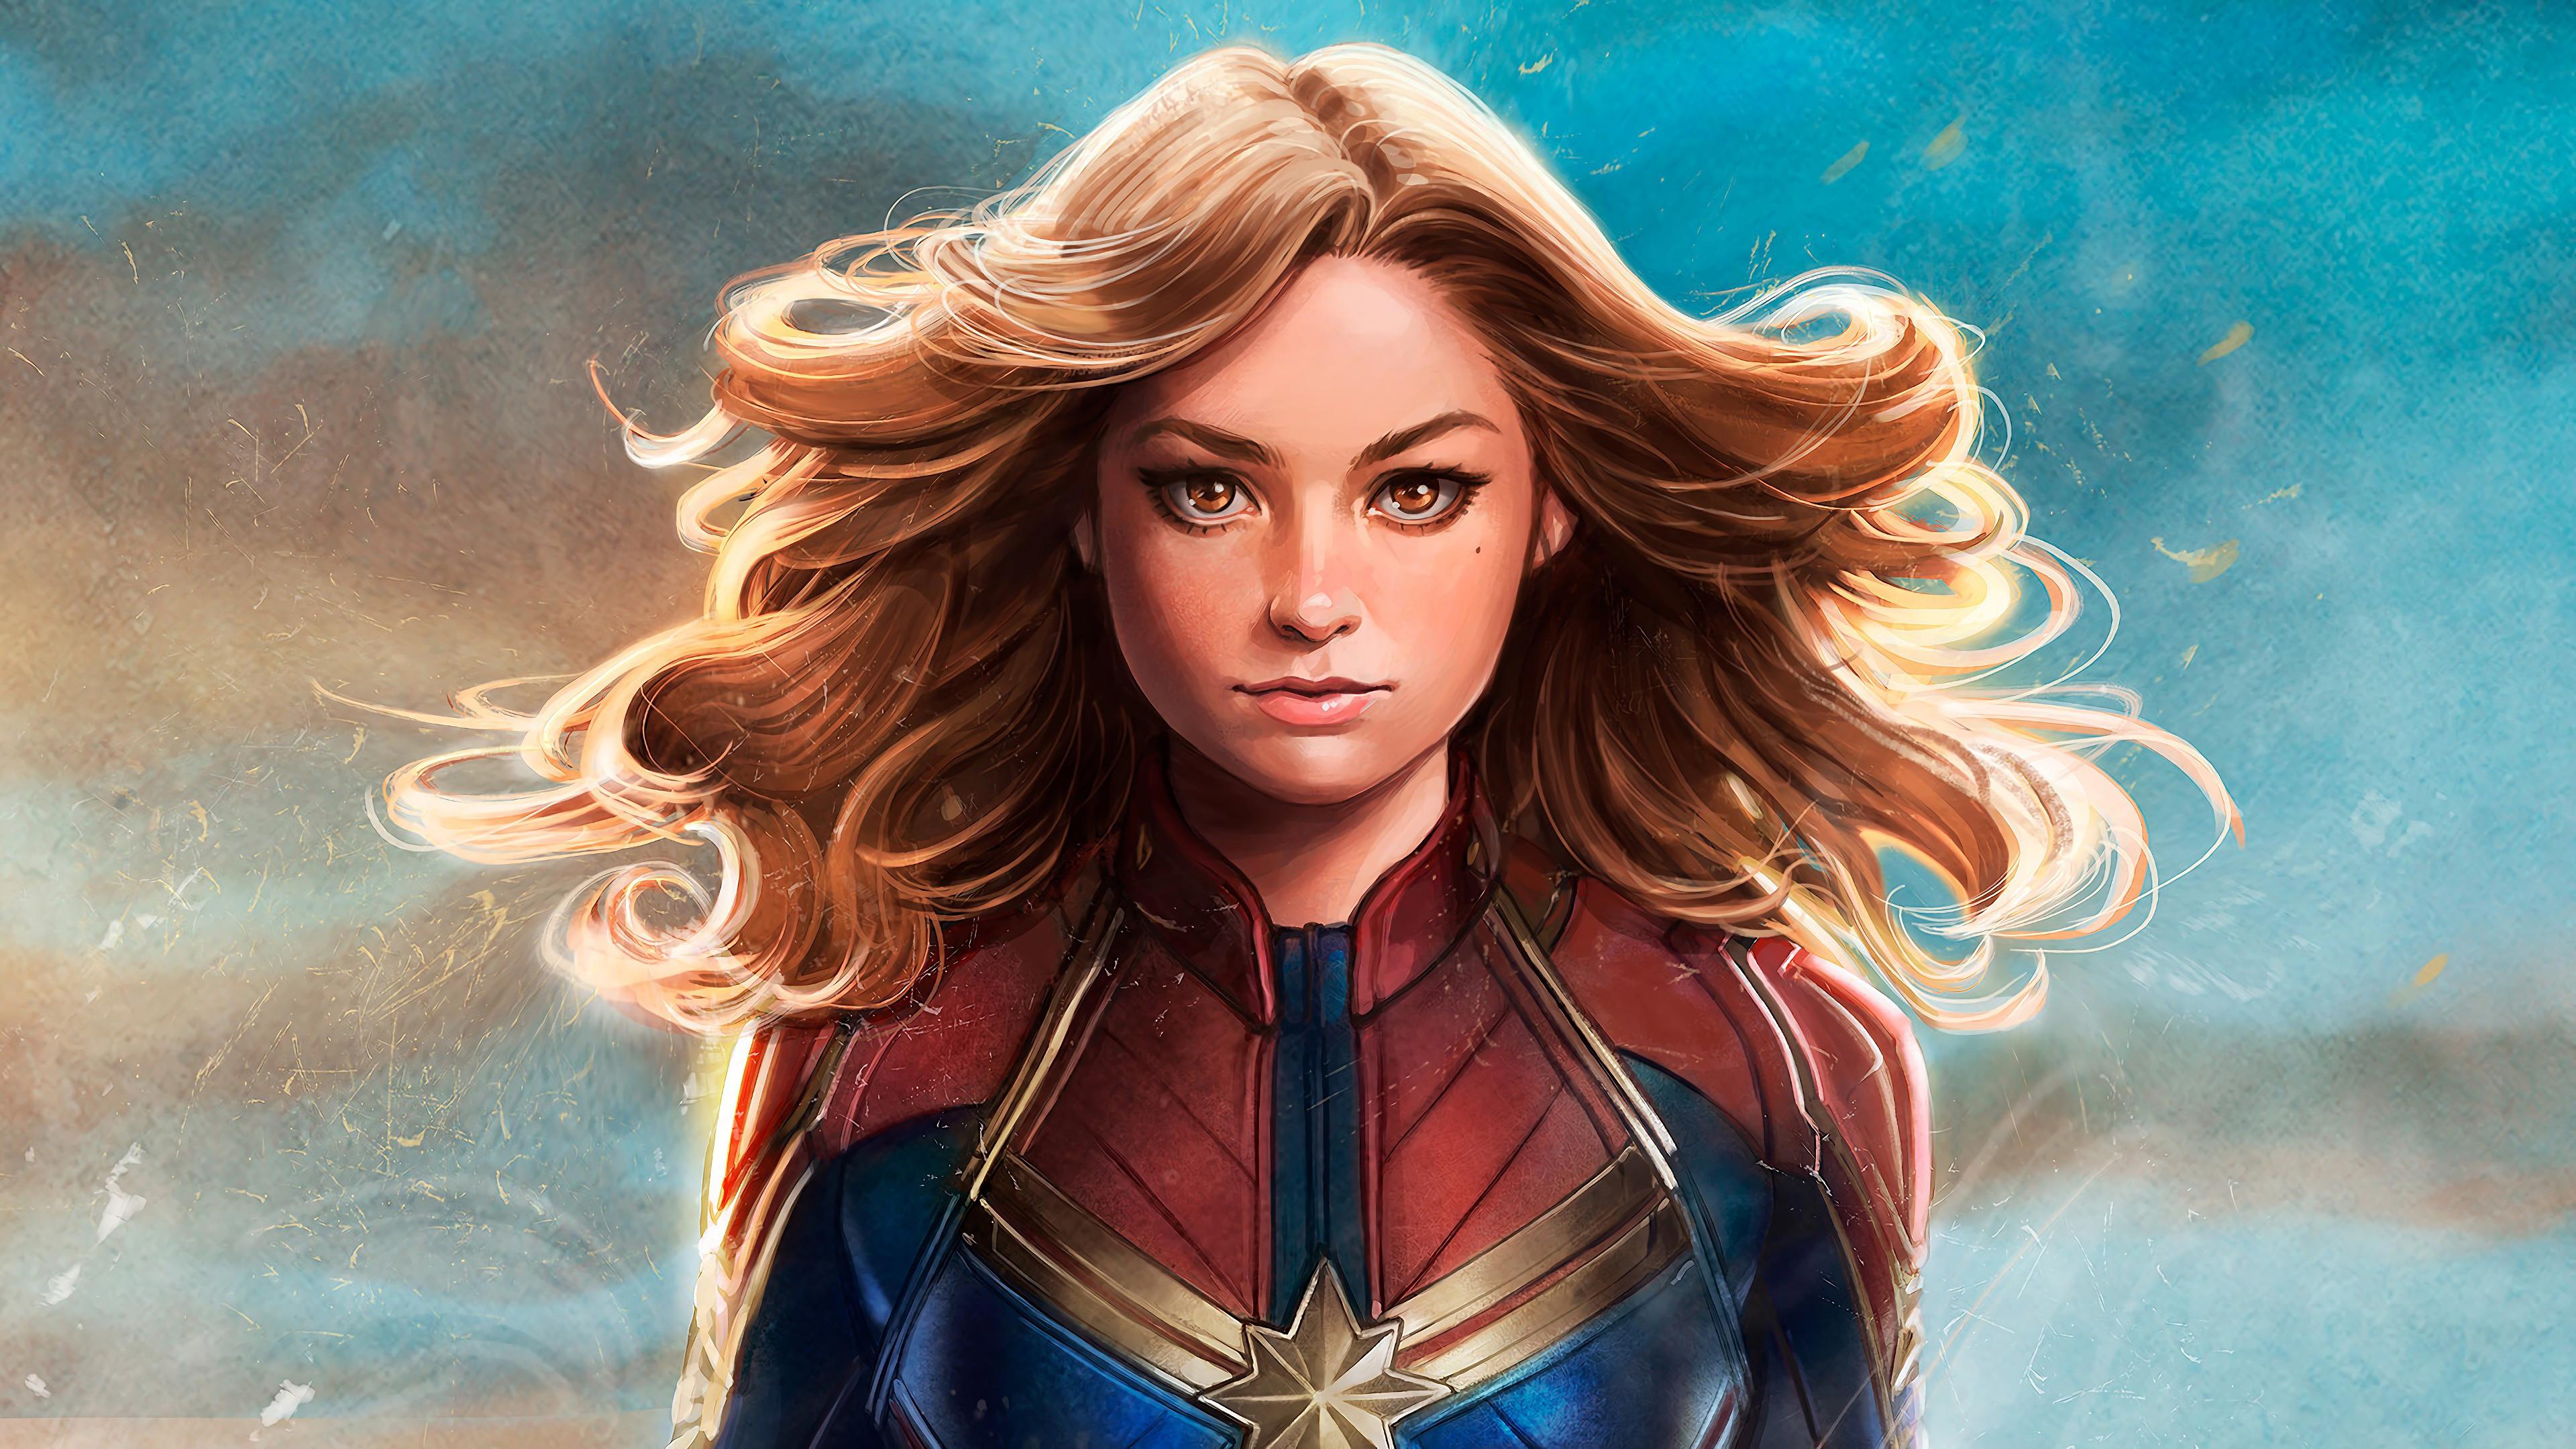 Captain Marvel Movie Comics Art 20K Wallpaper 20